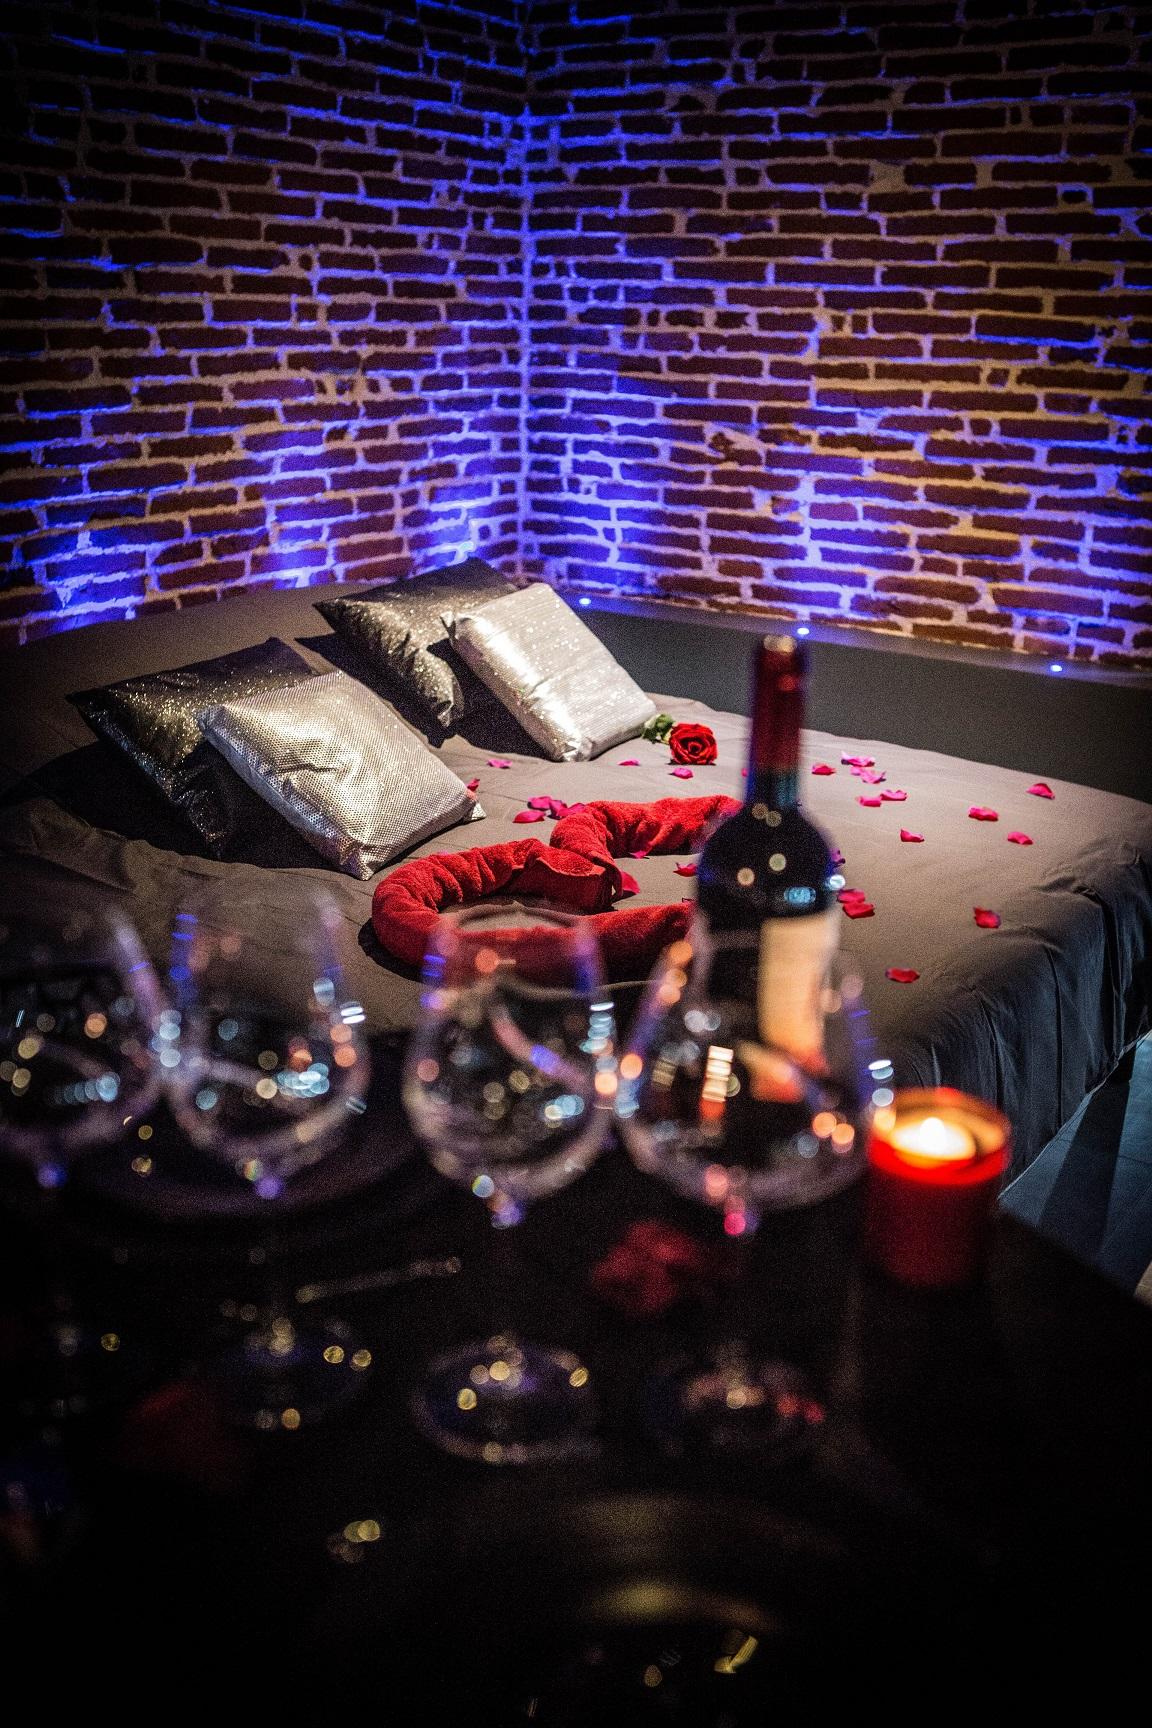 LOVALCOVE Nuit d amour